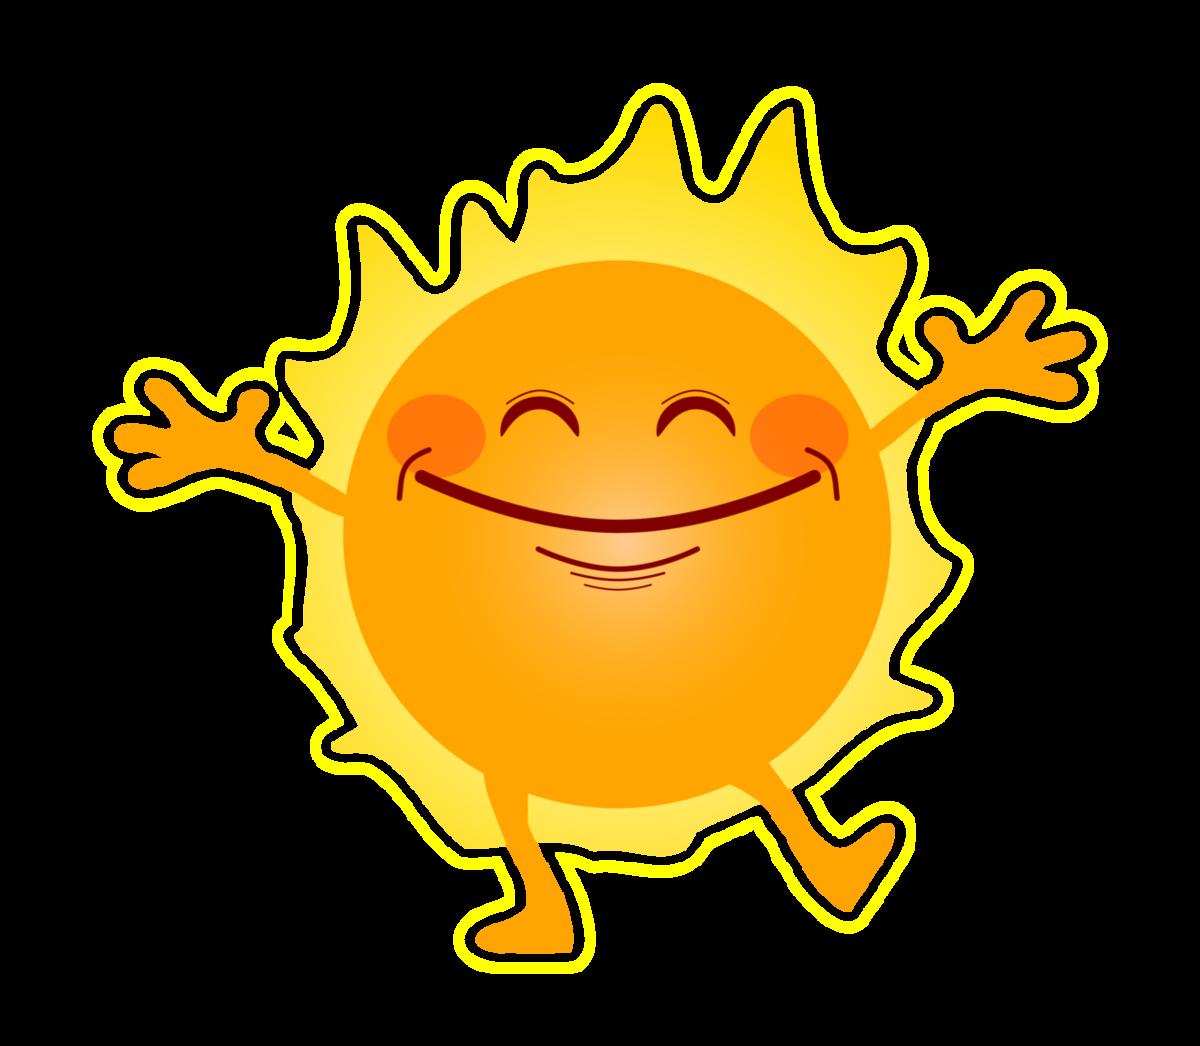 Солнышко картинка смешное